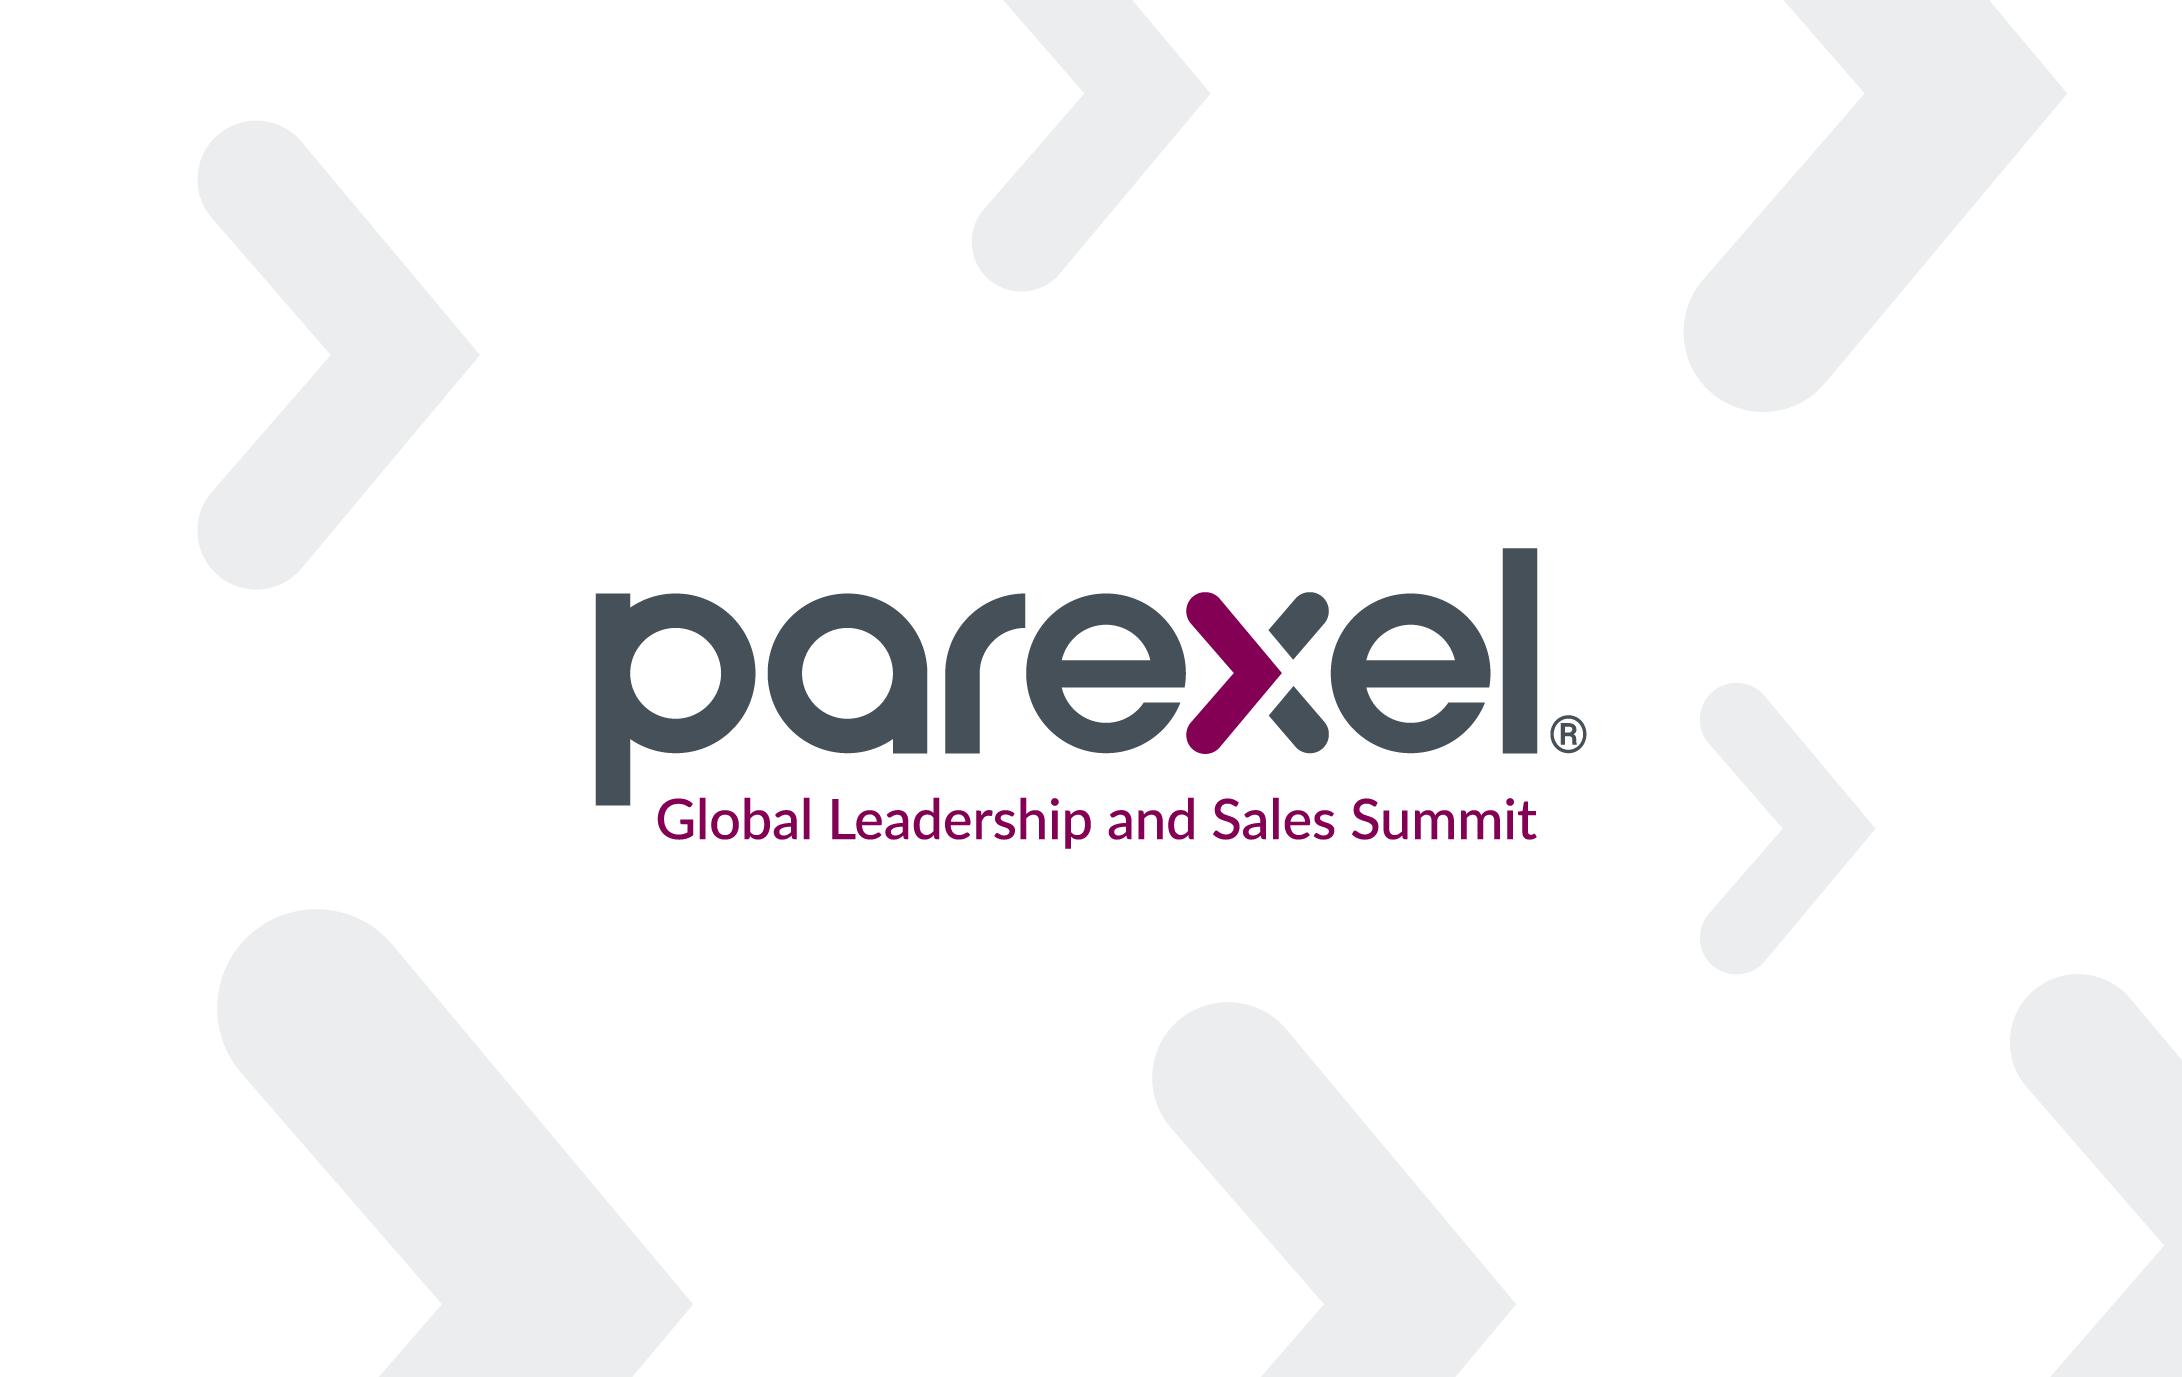 Parexel Global Leadership and Sales Summit Portfolio Link